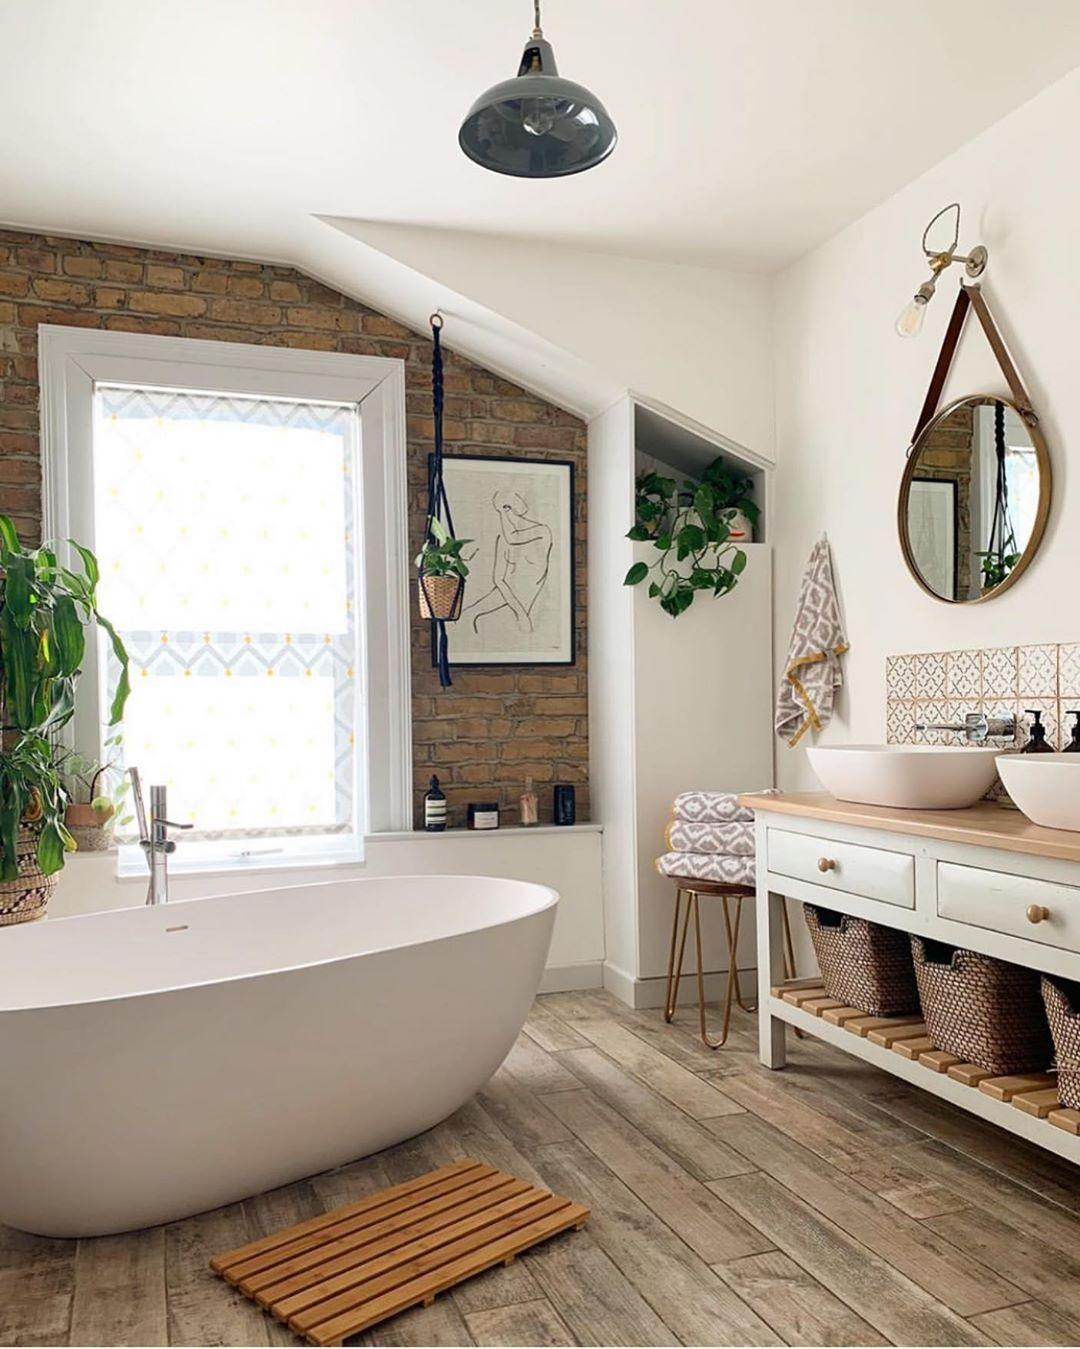 "Photo of Mid Century•Boho•Farmhouse on Instagram: ""Hello dream bathroom 😍 this is absolutely stunning!…"